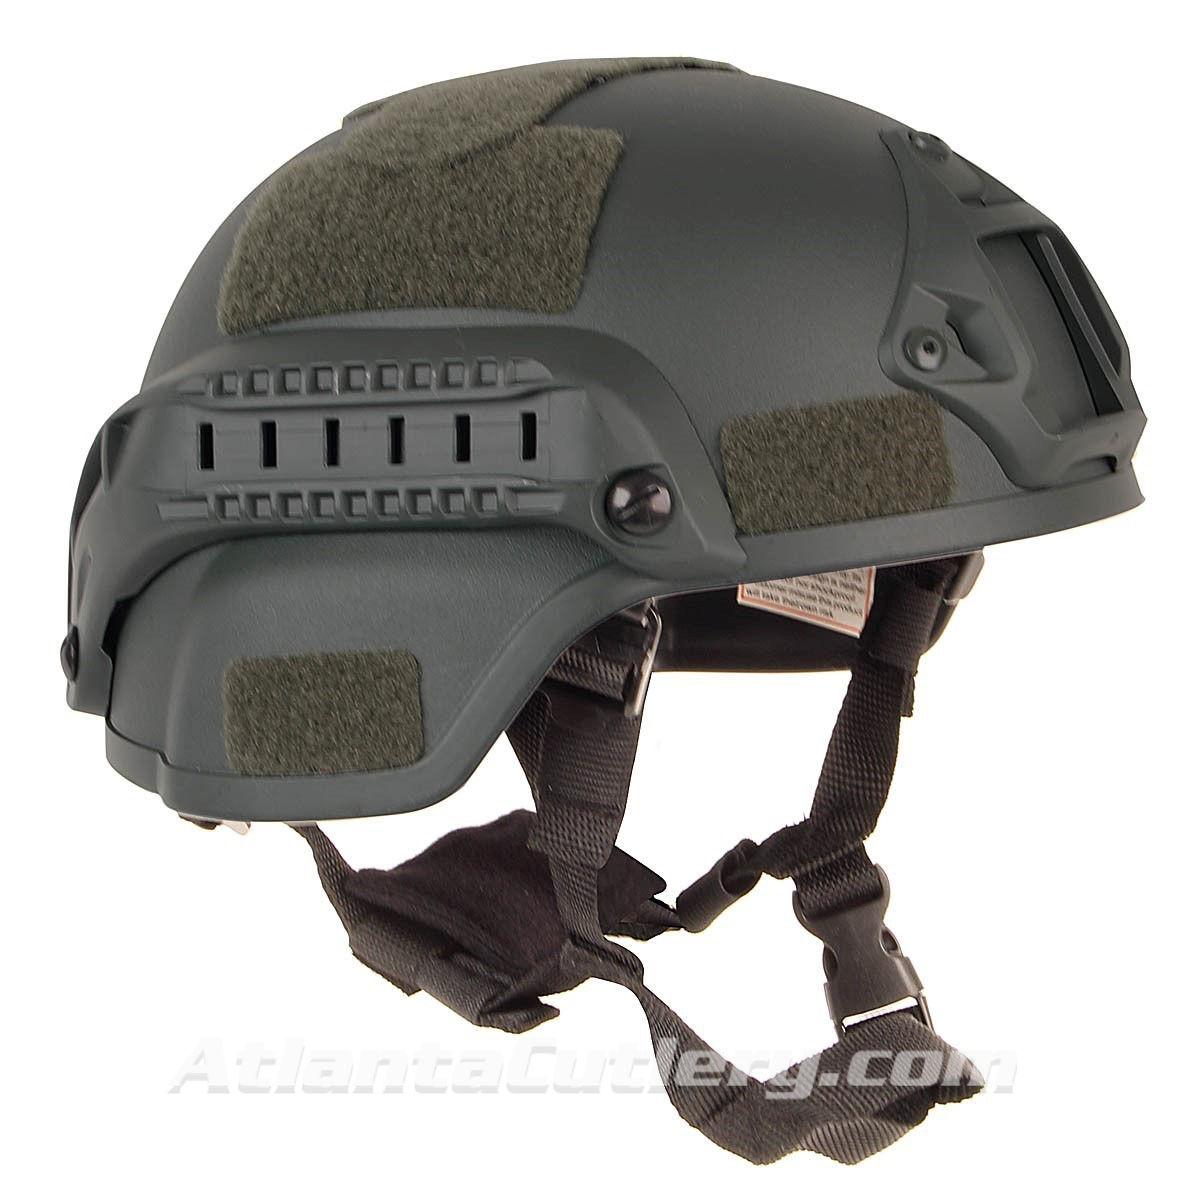 IBH MICH 2001 Replica Helmet